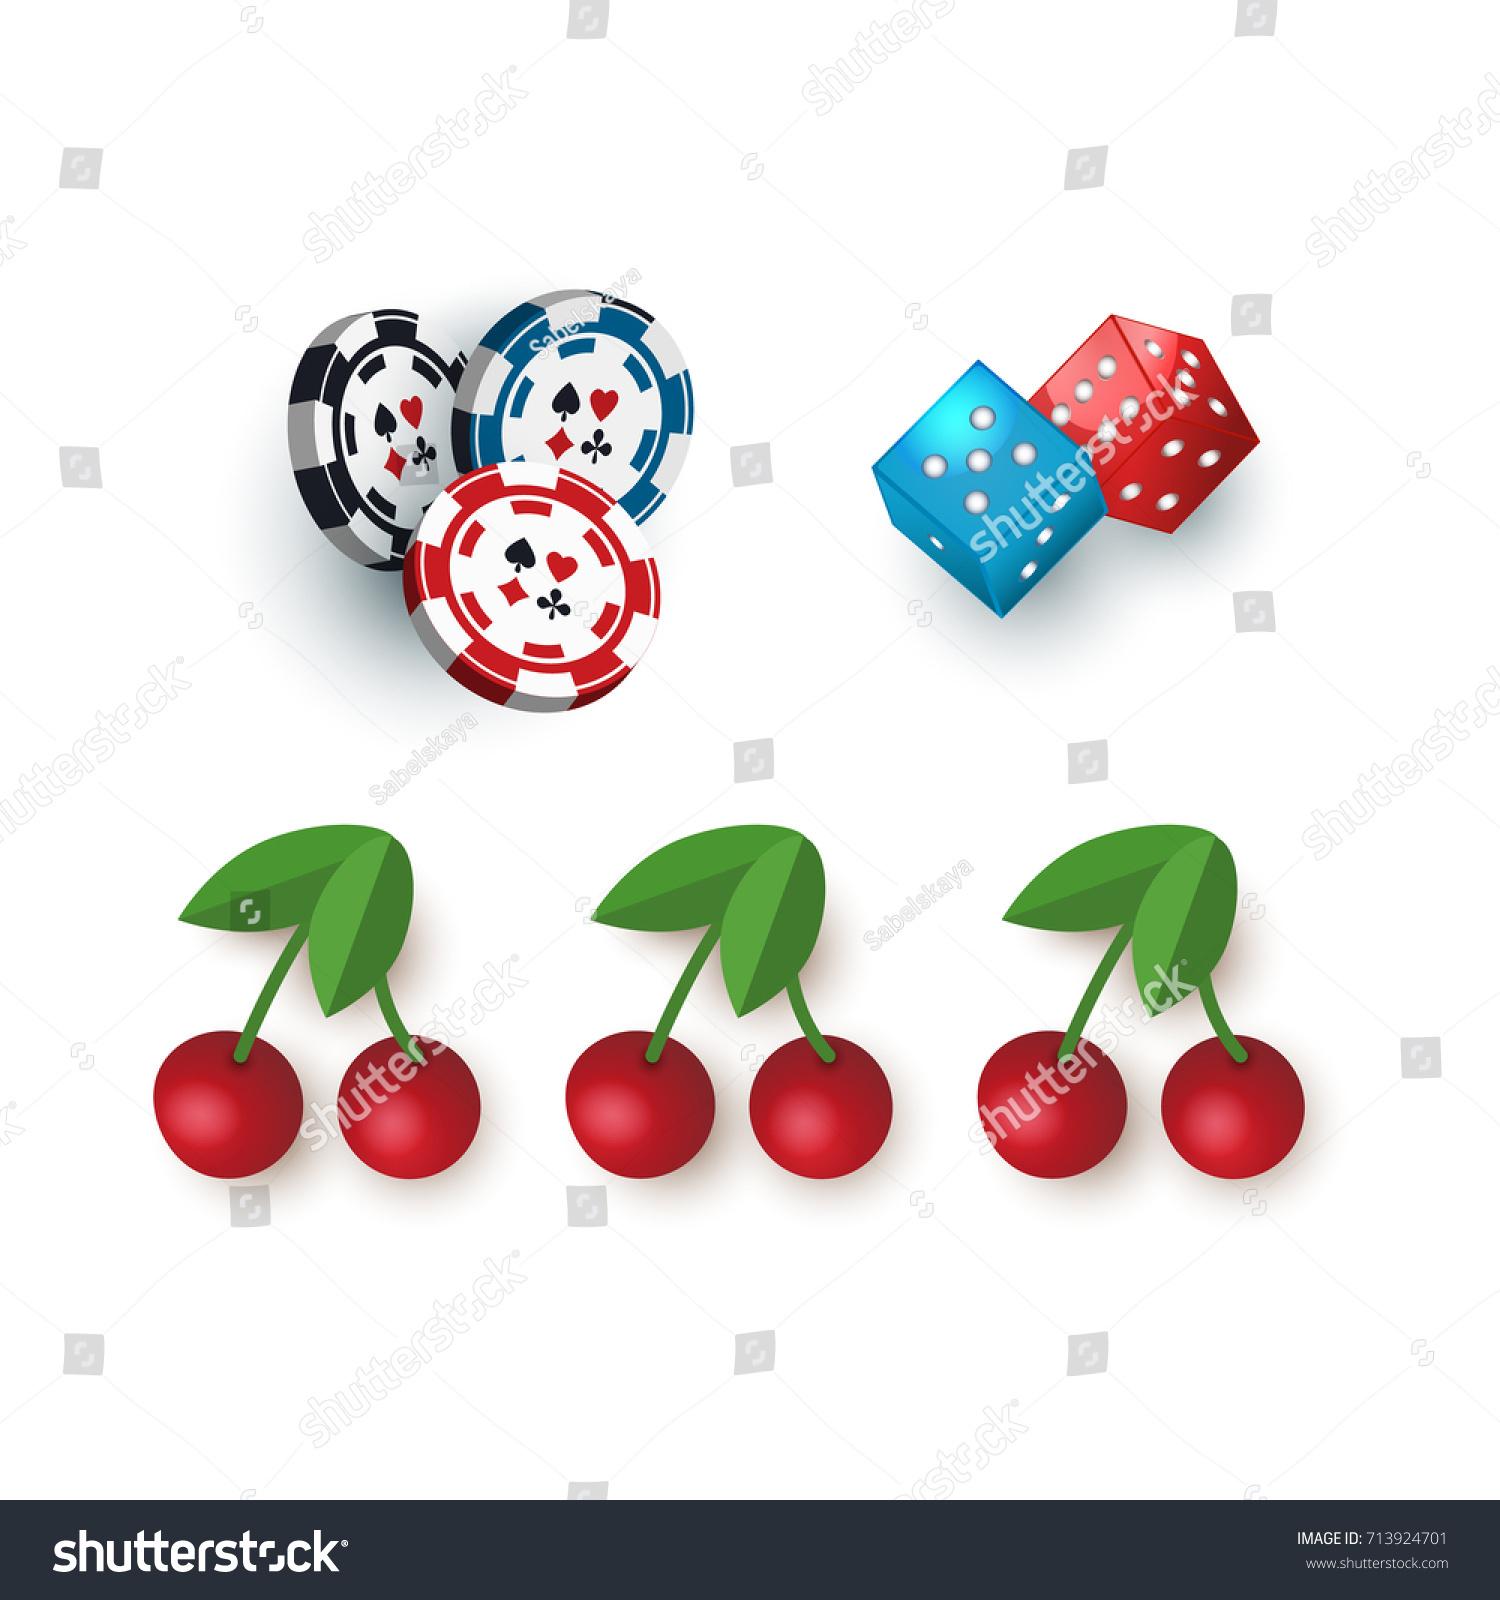 Berry casino cherry vijas casino